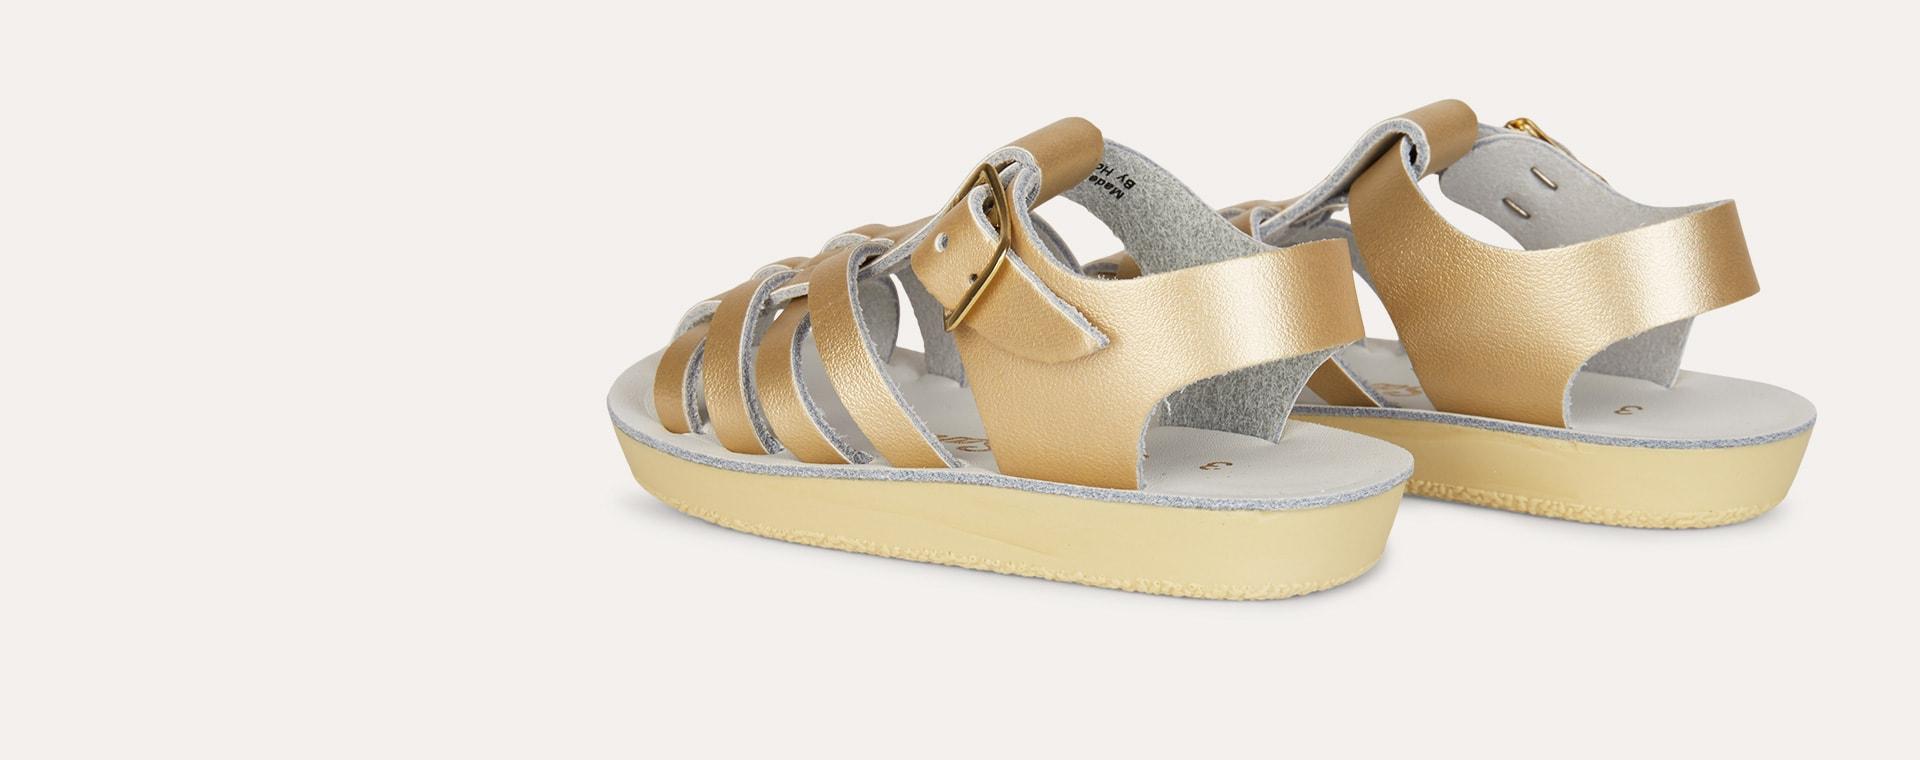 Gold Salt-Water Sandals Sailor Sandal